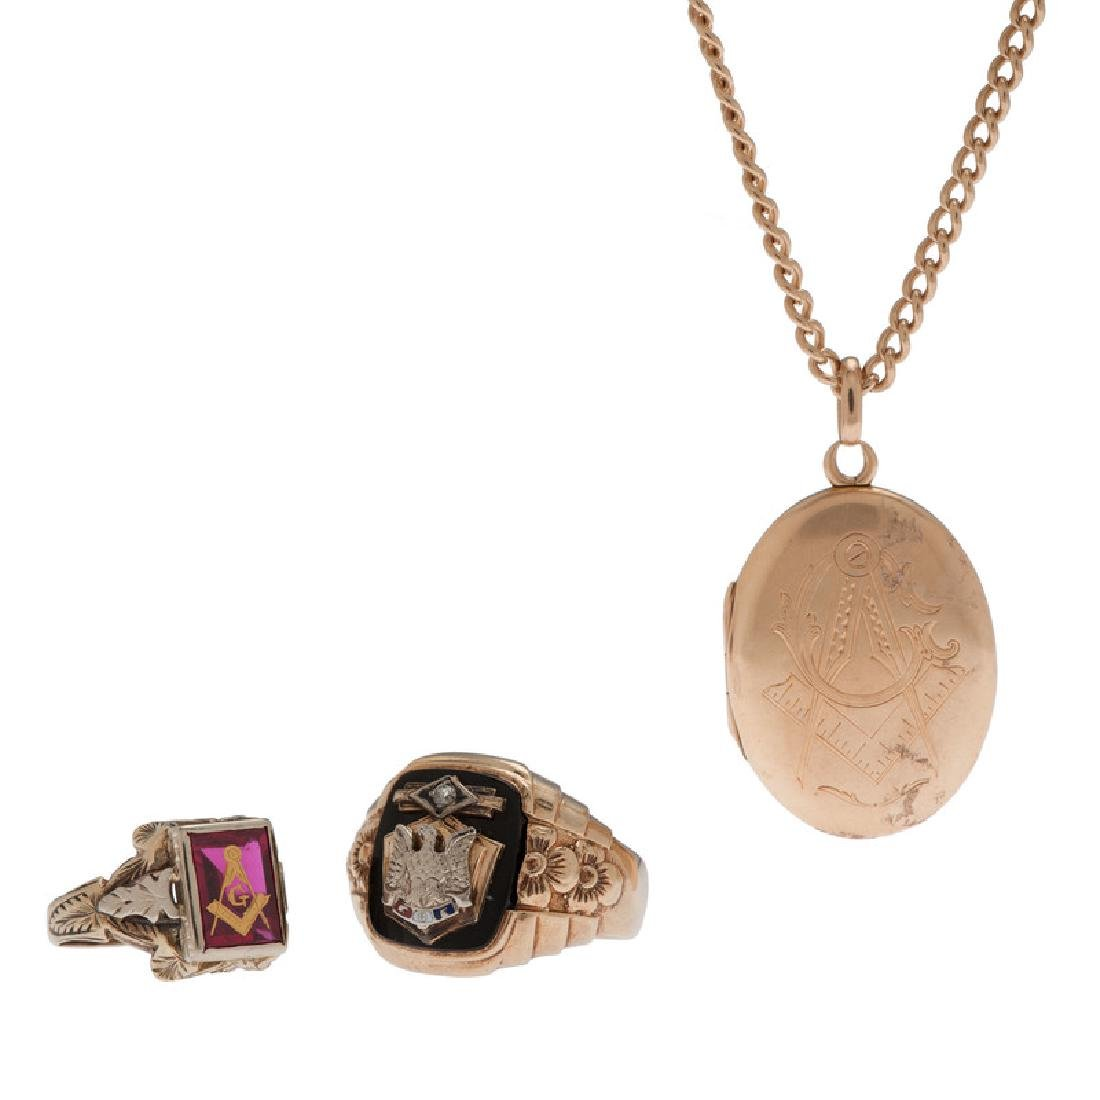 10 Karat Gold Fraternal Jewelry